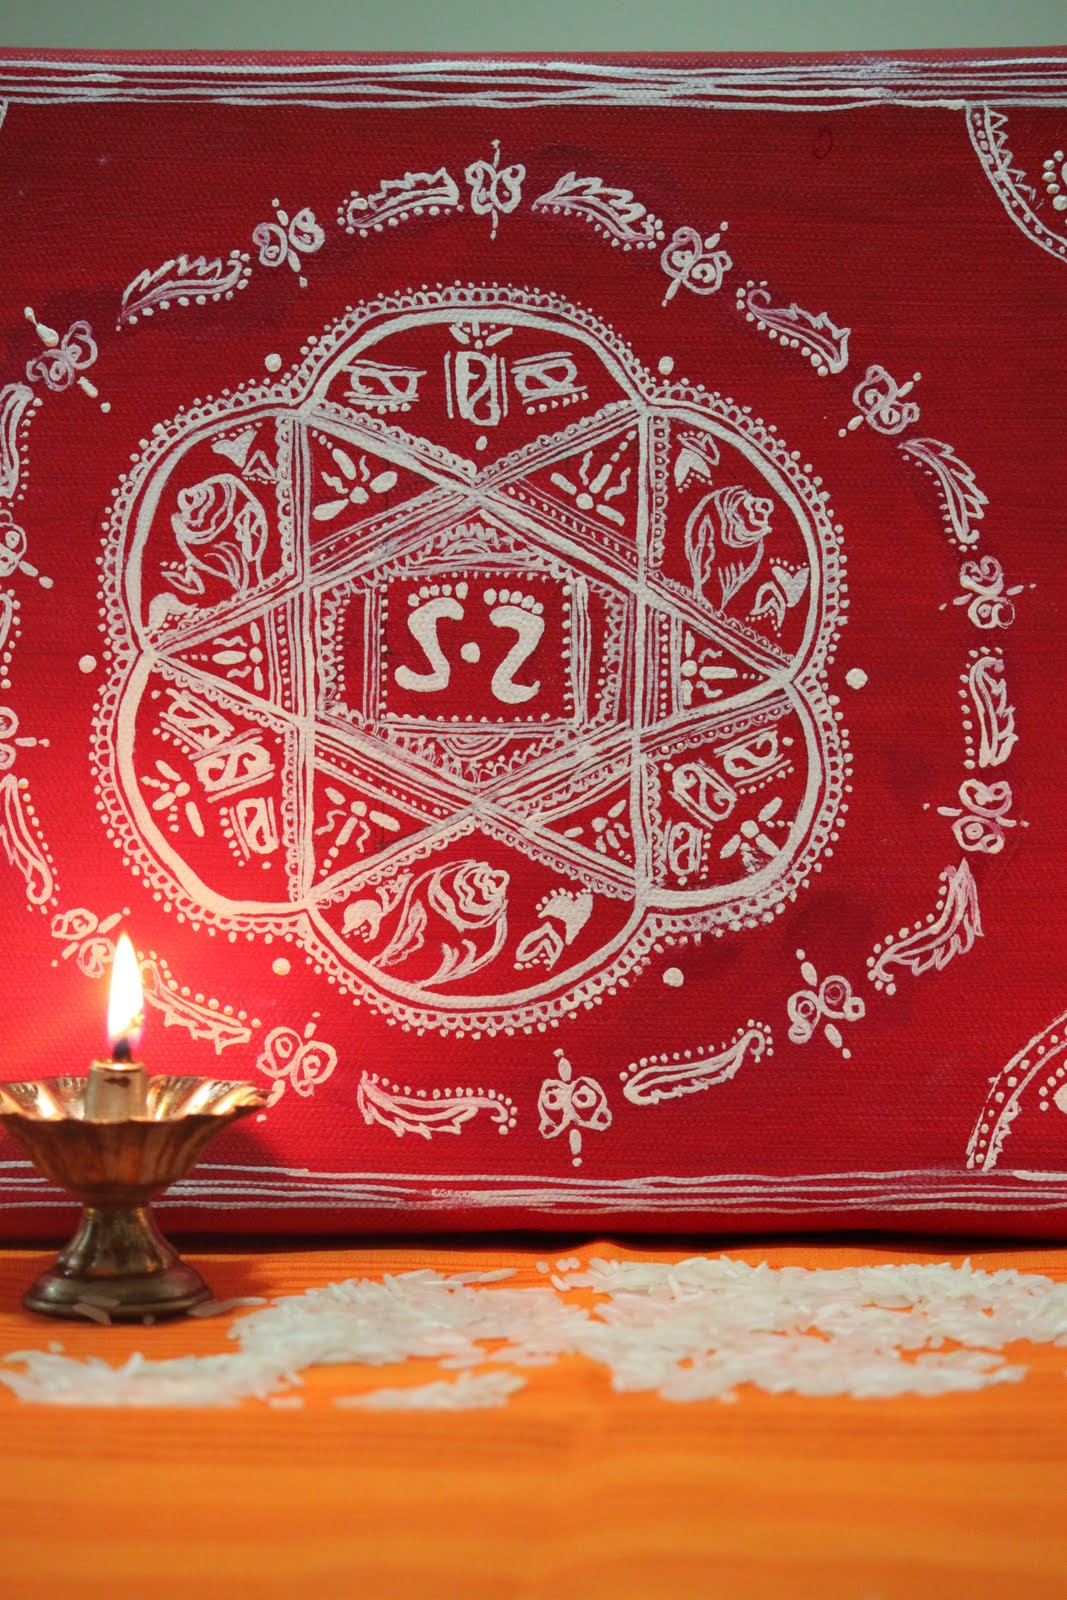 Deepi S World Aipan Traditional Art Of Kumaon